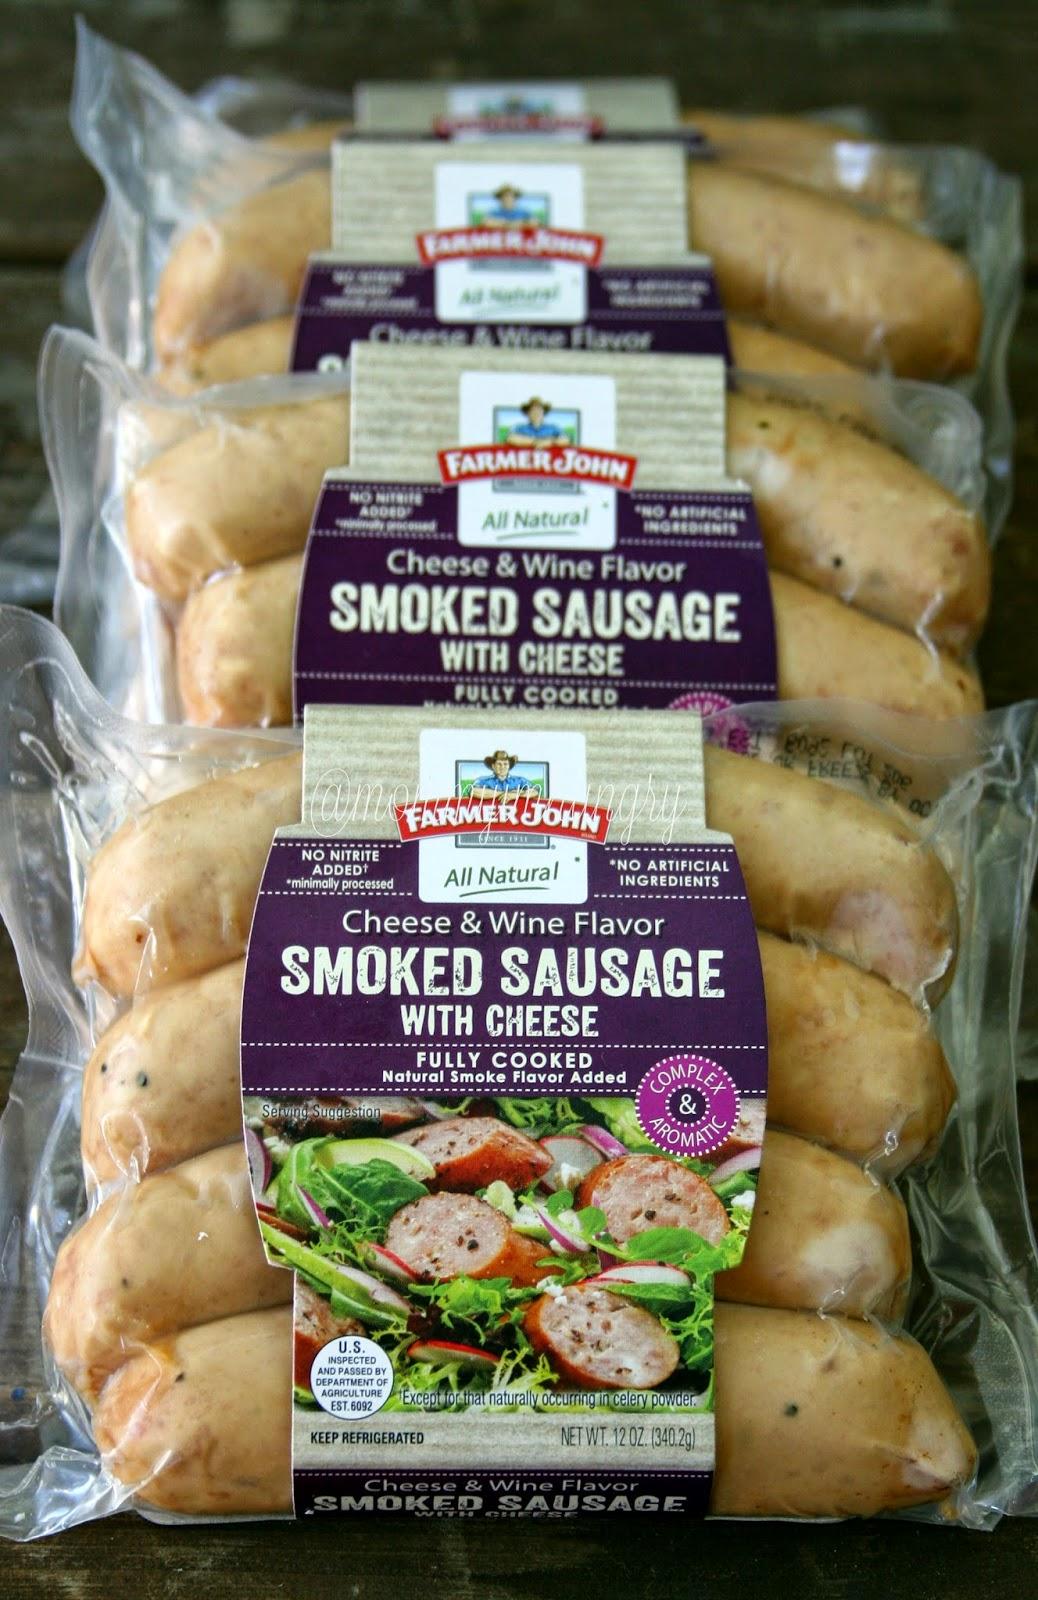 farmer john smoked sausage switcheroo: cheesy scalloped potatoes with sausage and peas #cookwithsausage